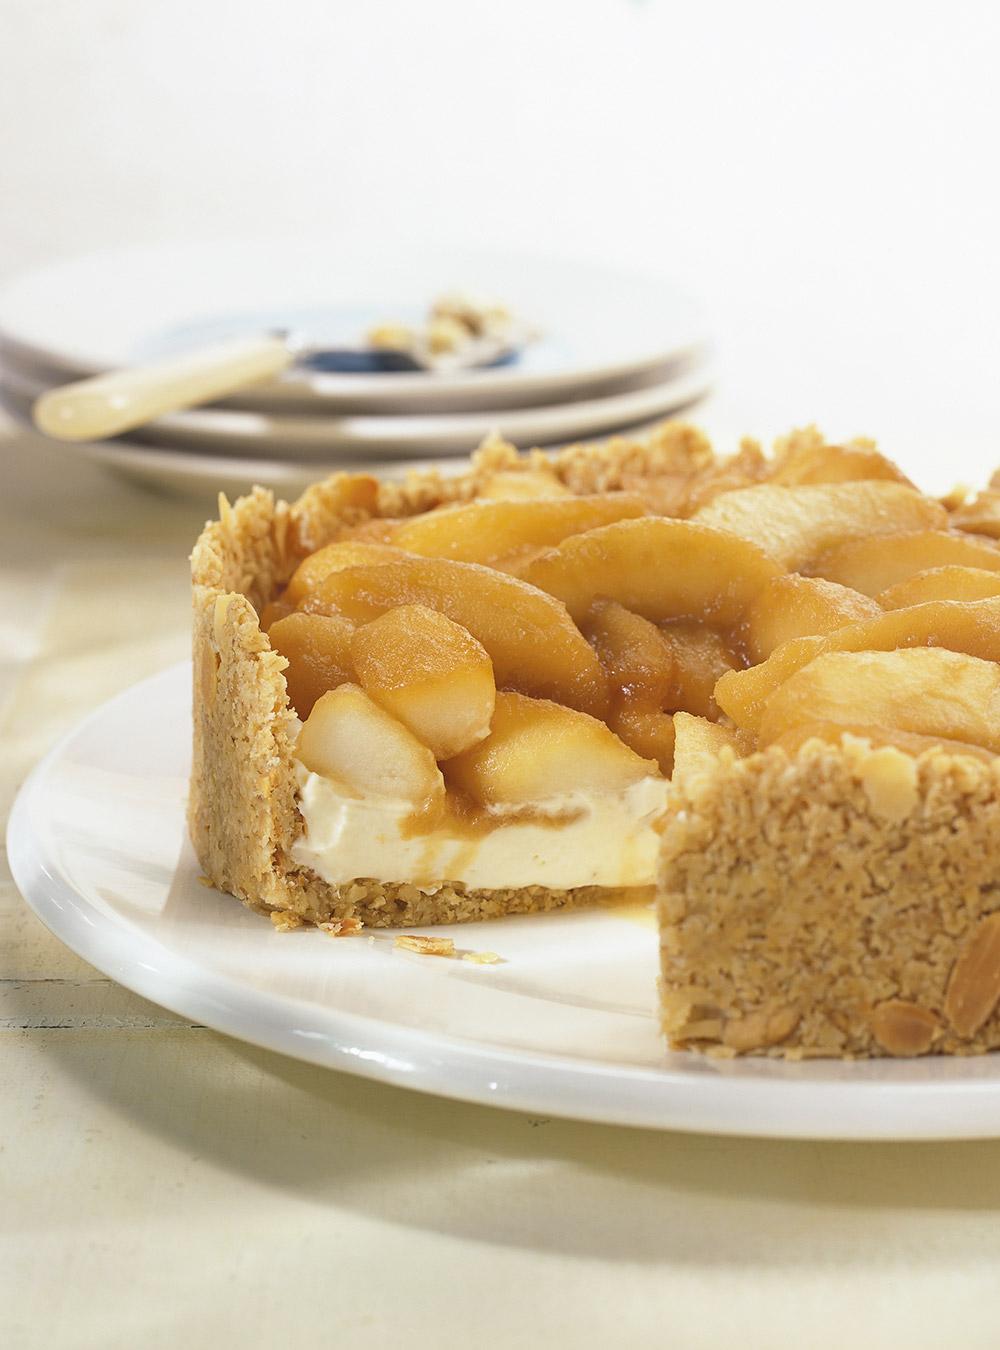 Tarte aux pommes caramélisées au calijo | ricardo